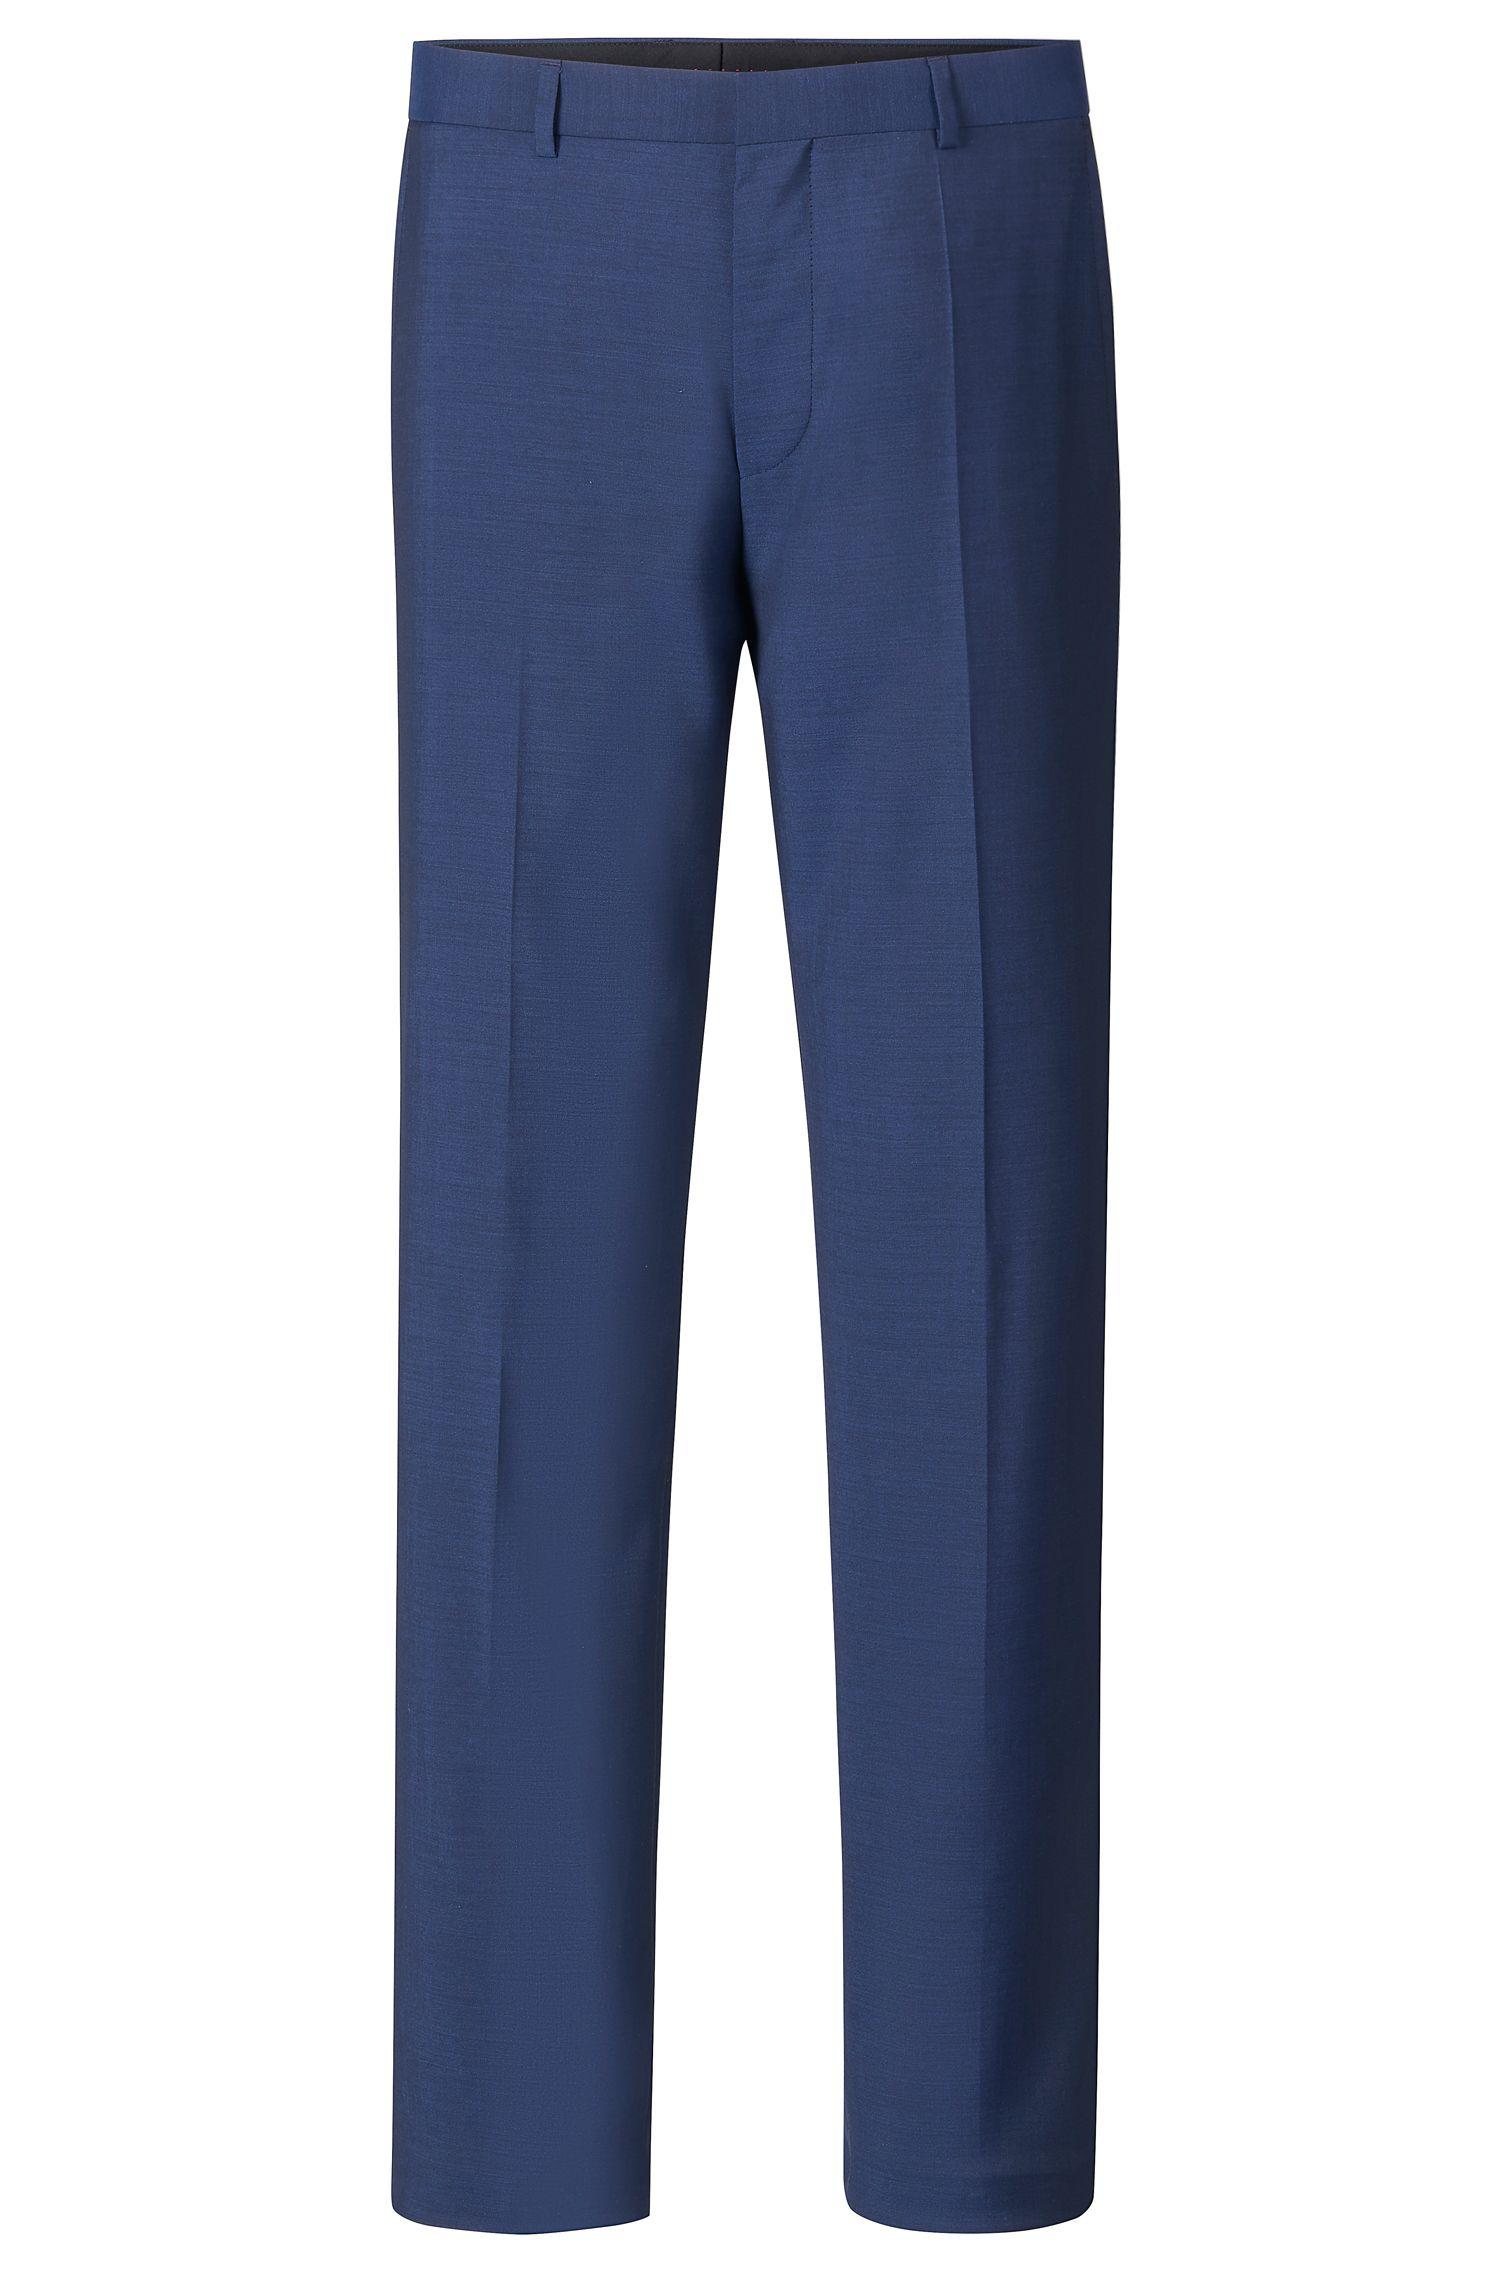 'Hamen'   Slim Fit, Virgin Wool Dress Pants